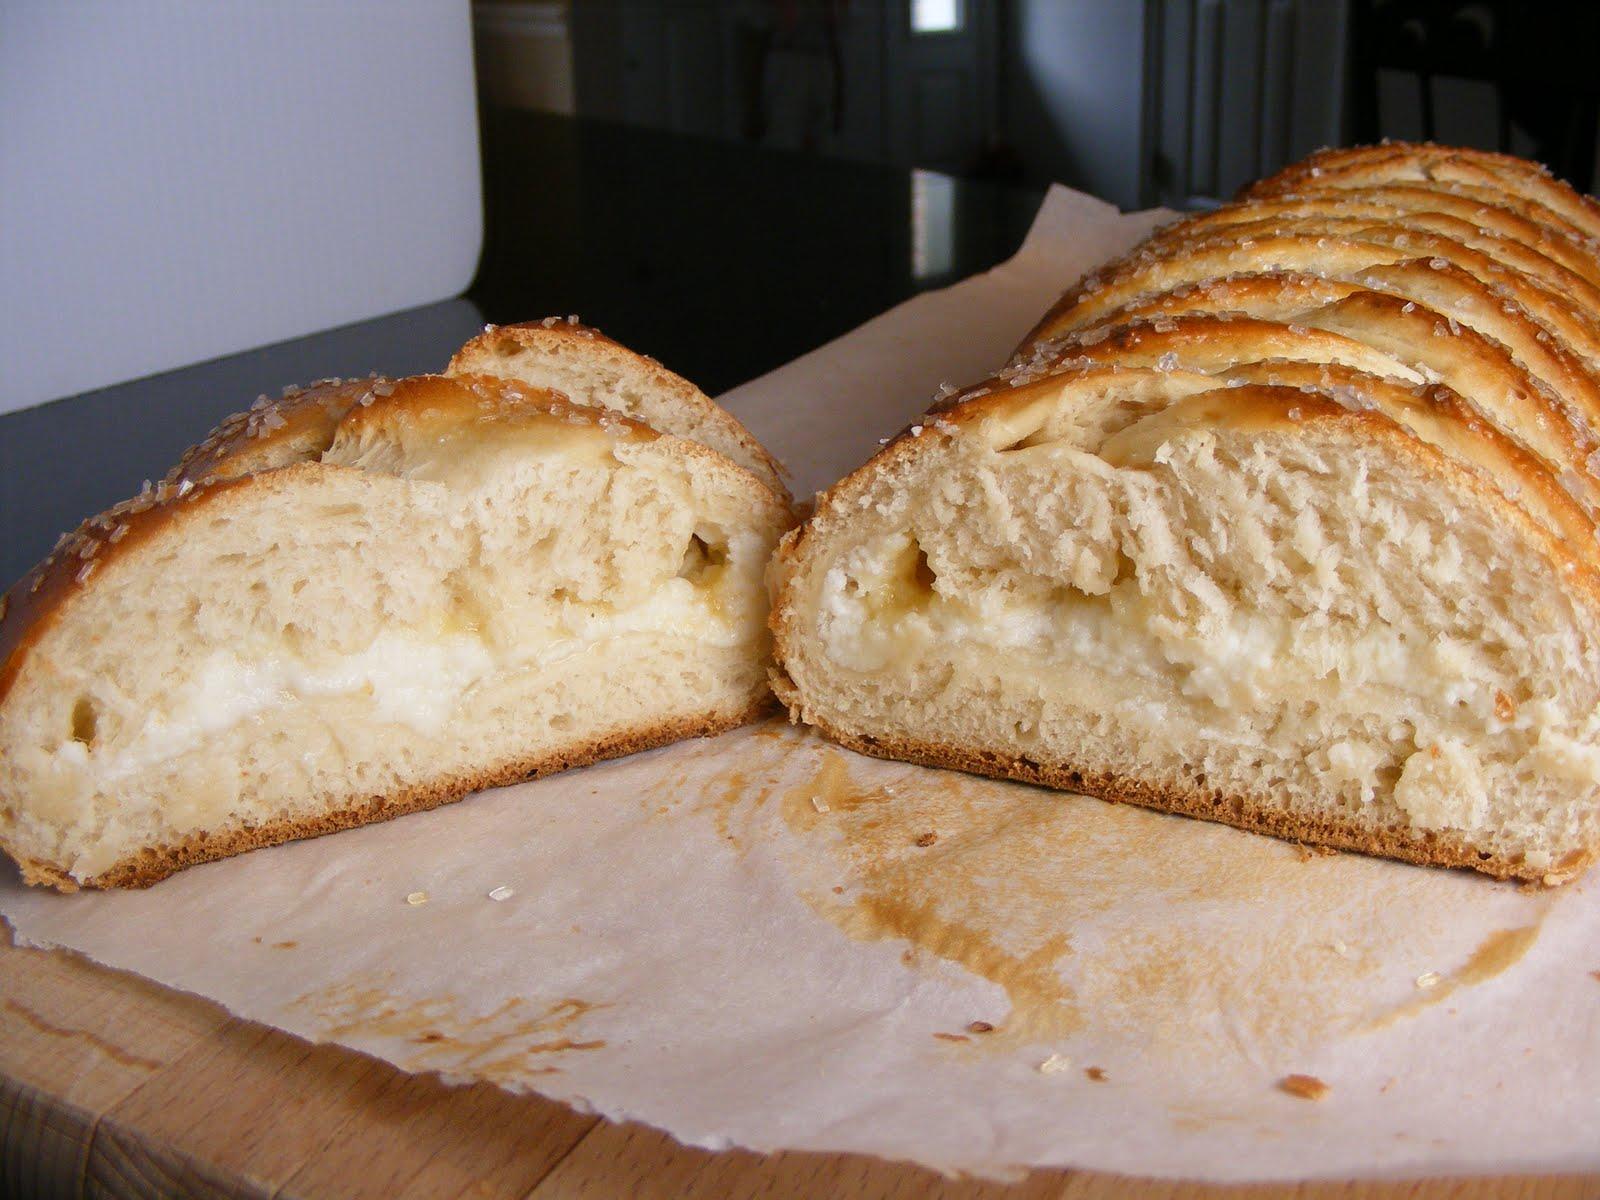 The Virtual Goody Plate: Braided Lemon Bread